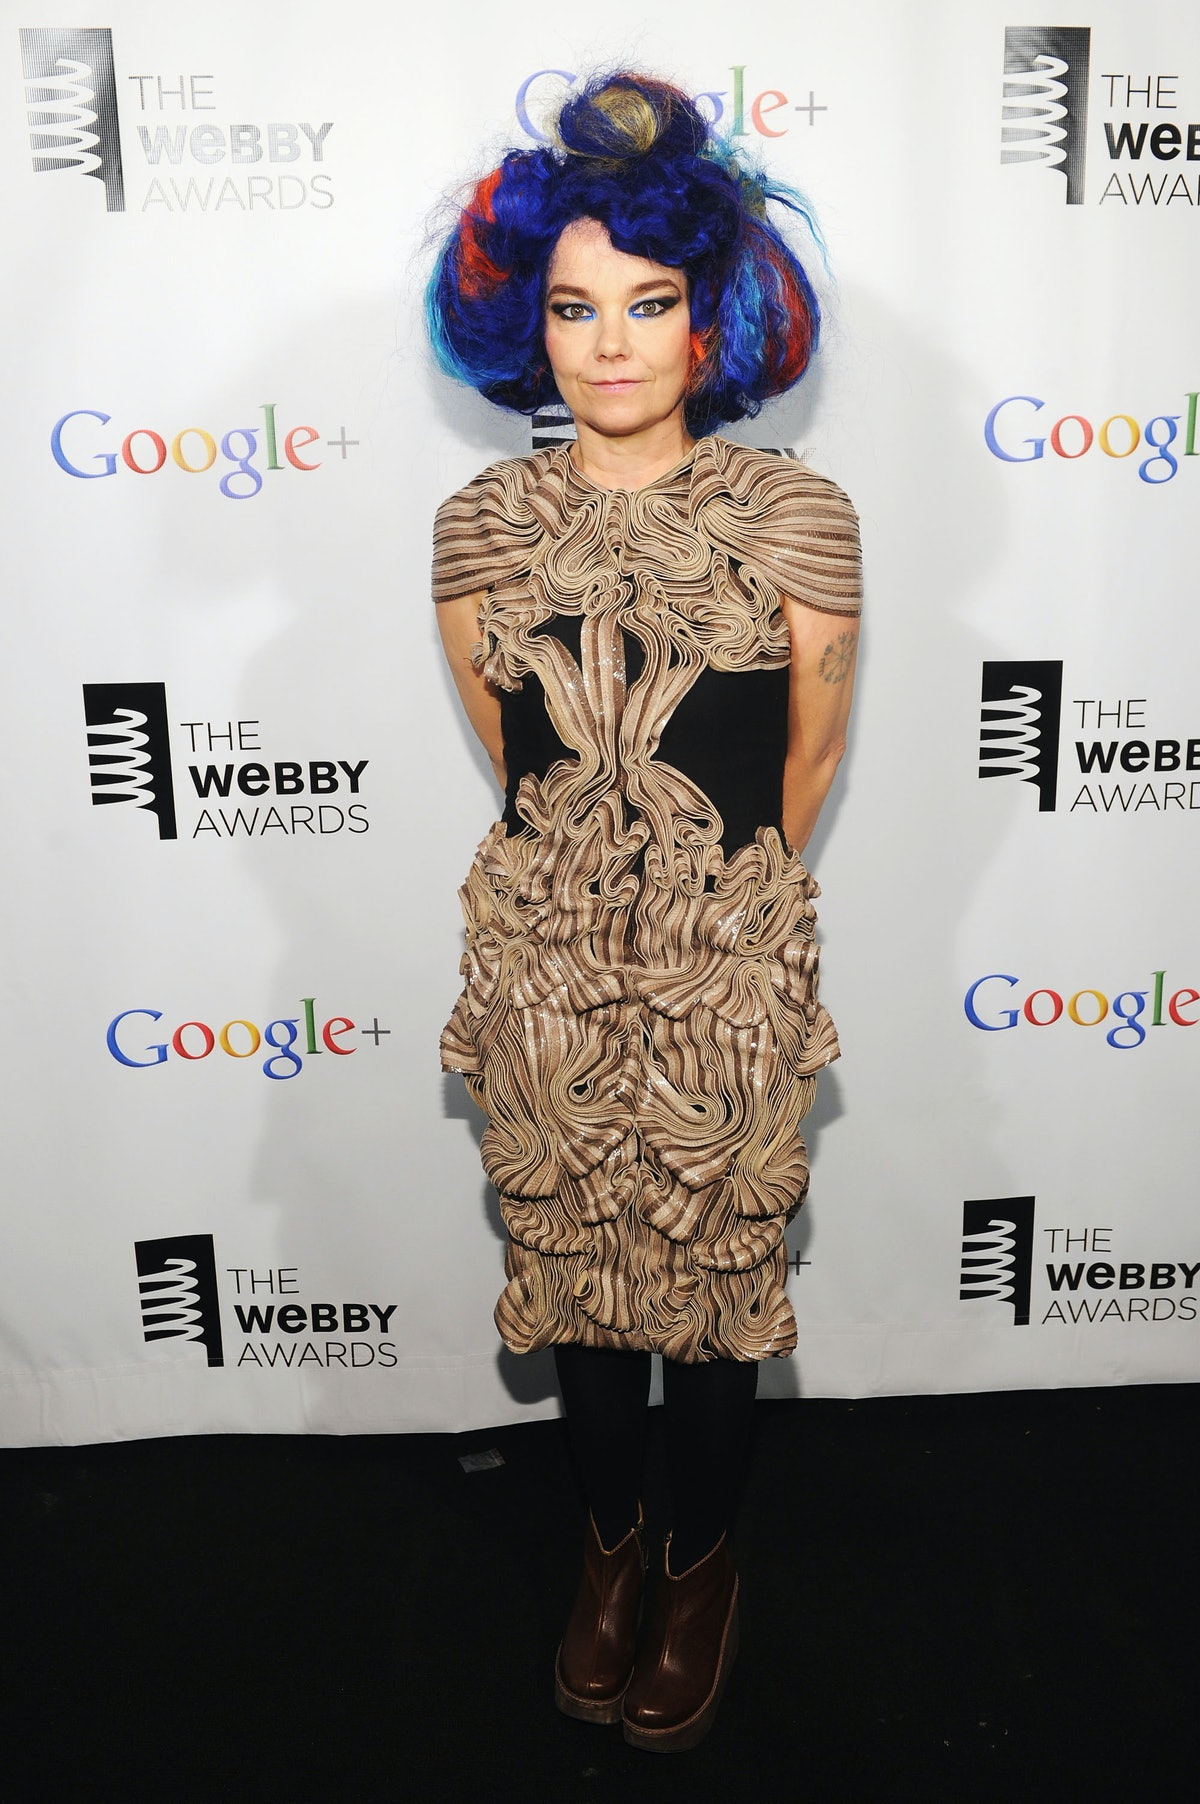 The 16th Annual Webby Awards - Inside